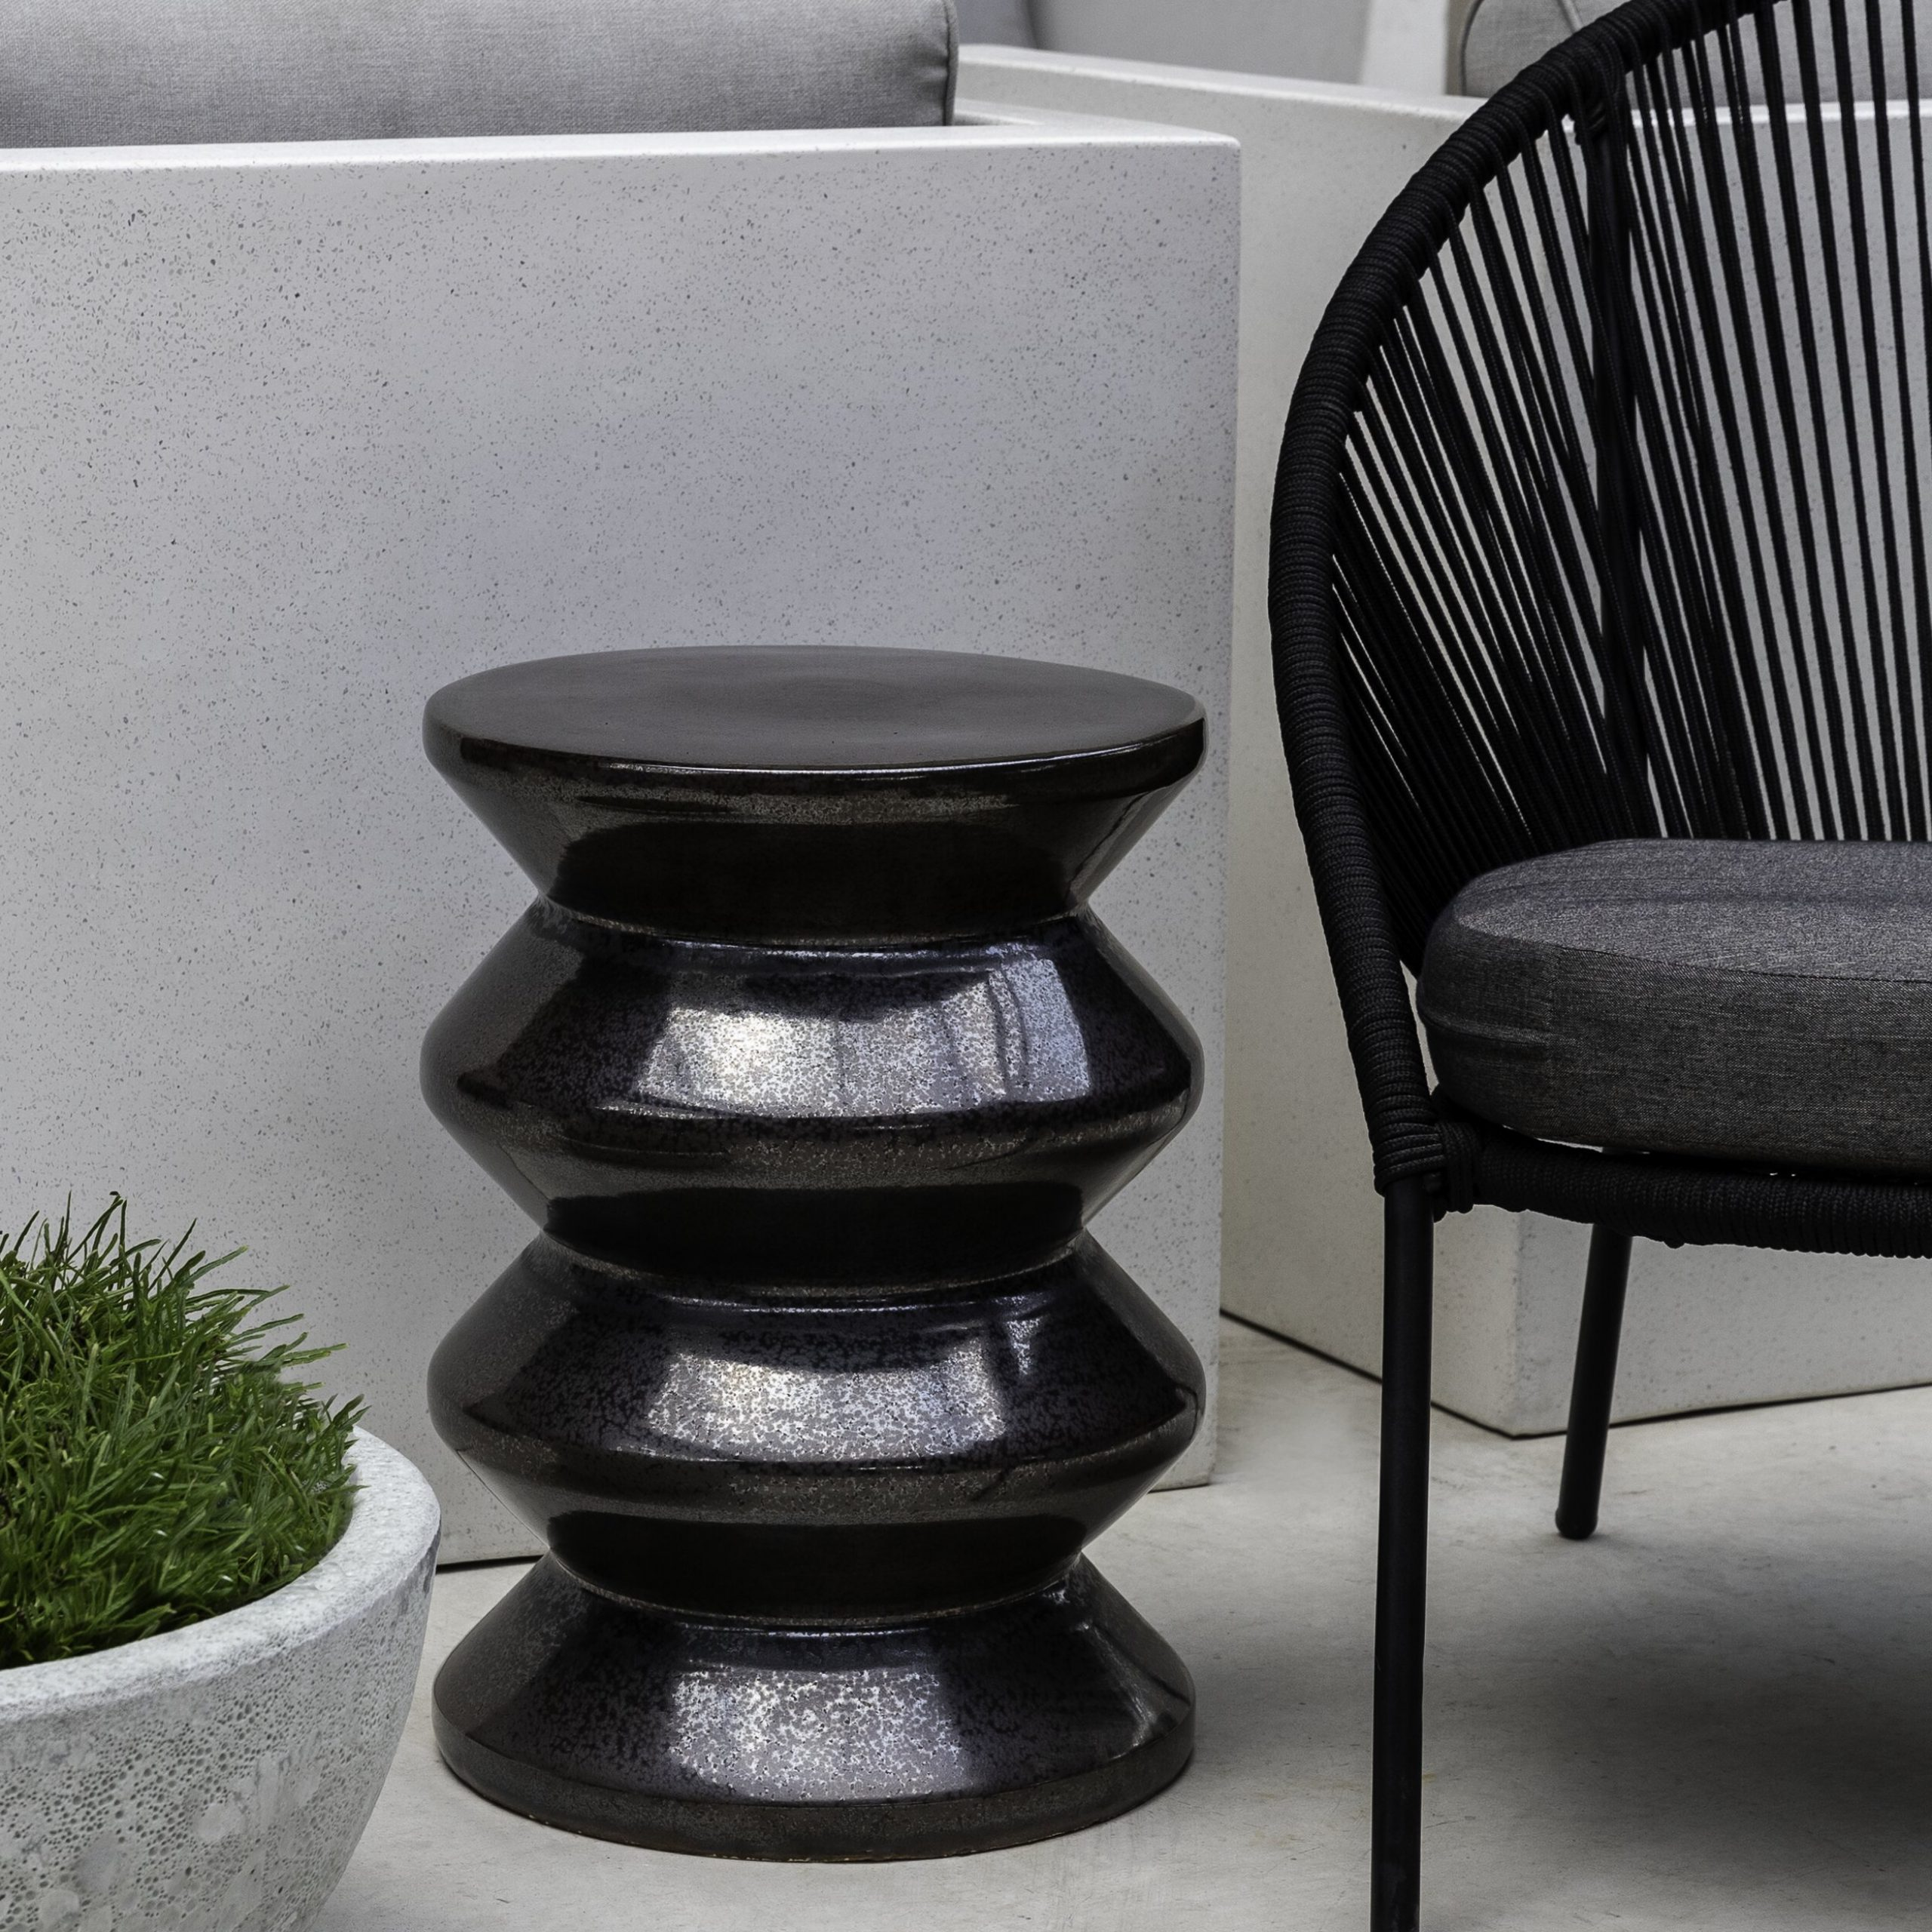 Carmon Ceramic Garden Tool For Favorite Zigzag Ceramic Garden Stool (View 20 of 30)